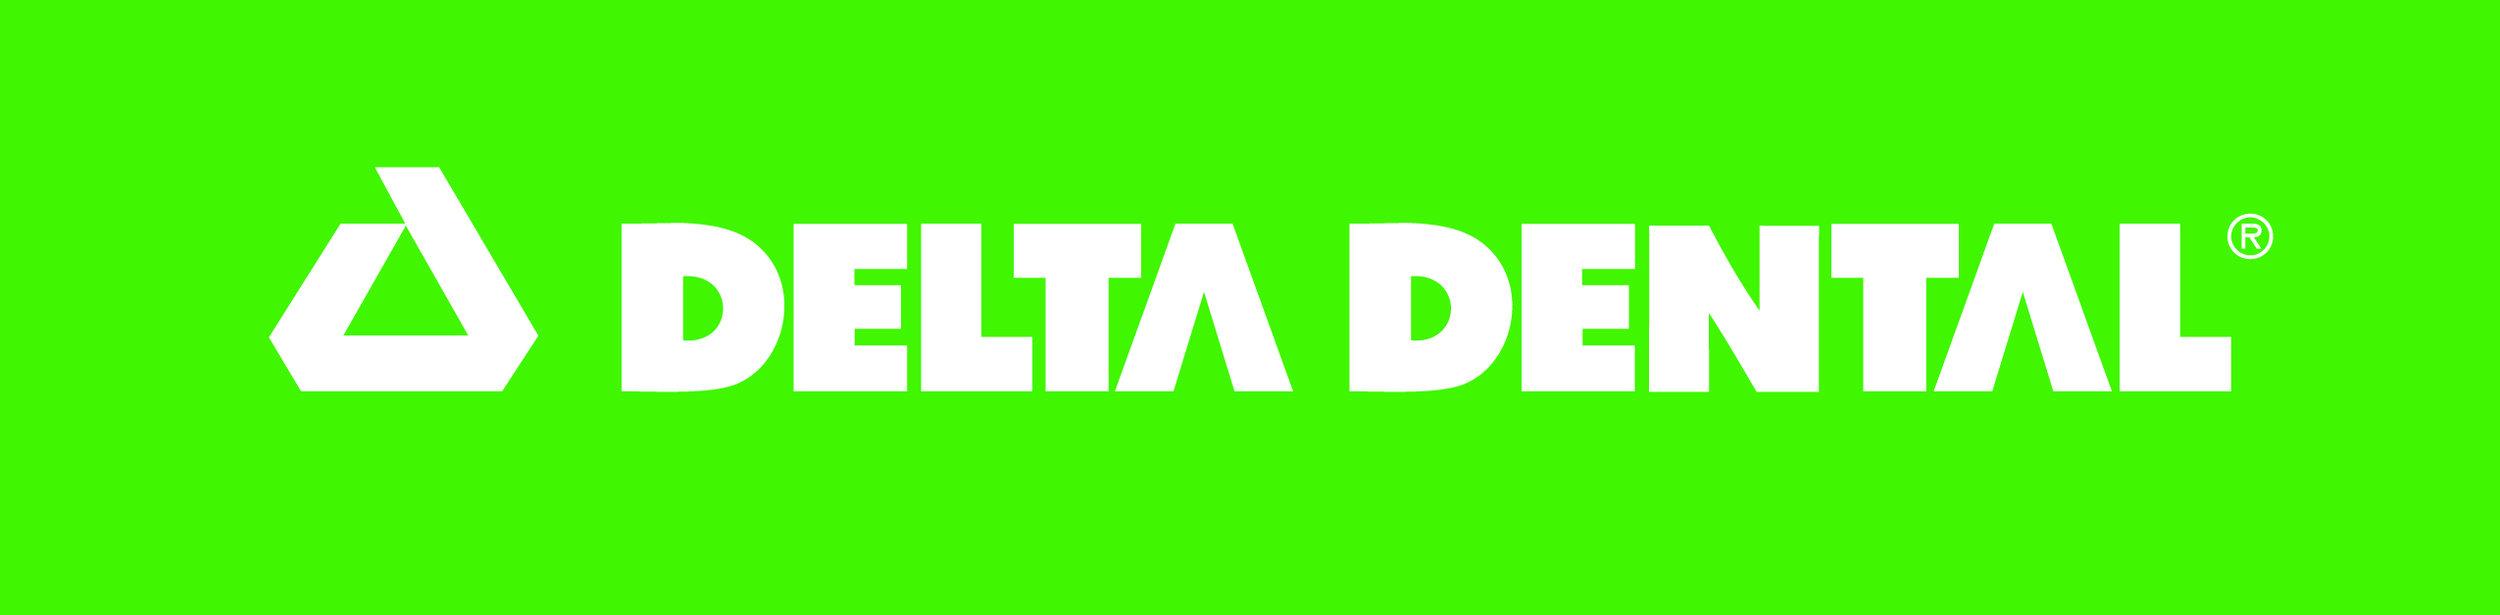 Delta Dental Logo 361C (CMYK).jpg